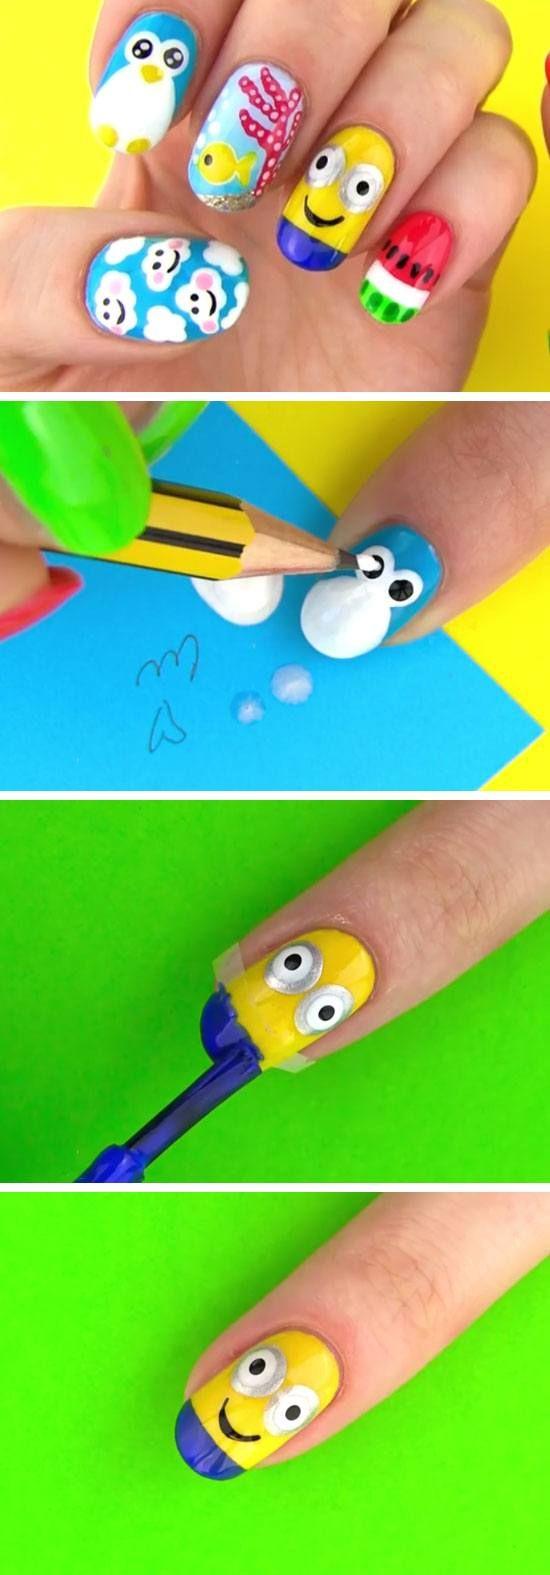 The 75 best Nails images on Pinterest | Fingernail designs, Nail art ...